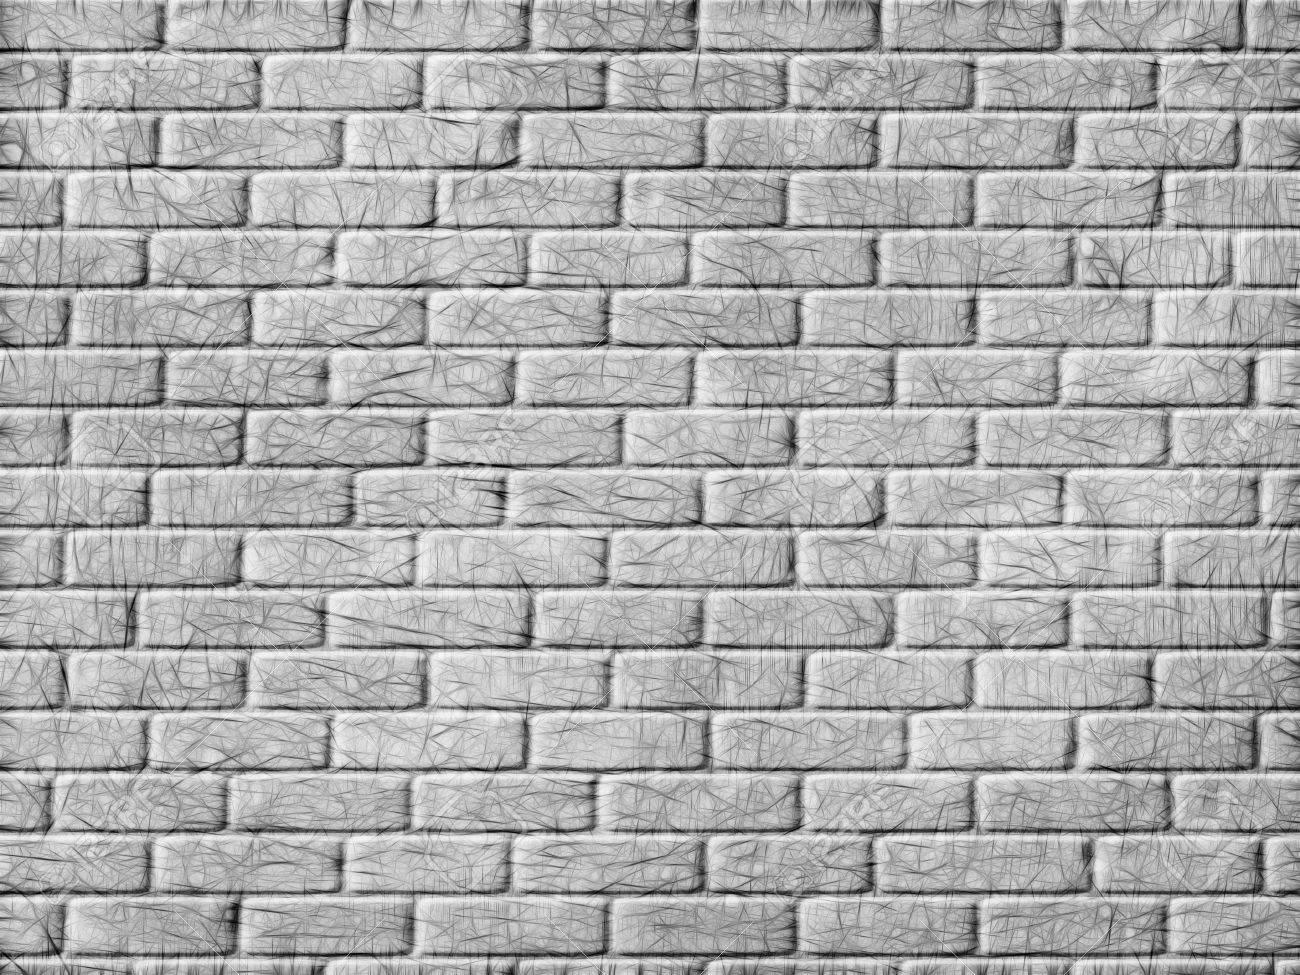 Monochrome brick wall background  Digitally generated image Stock Photo - 23445090